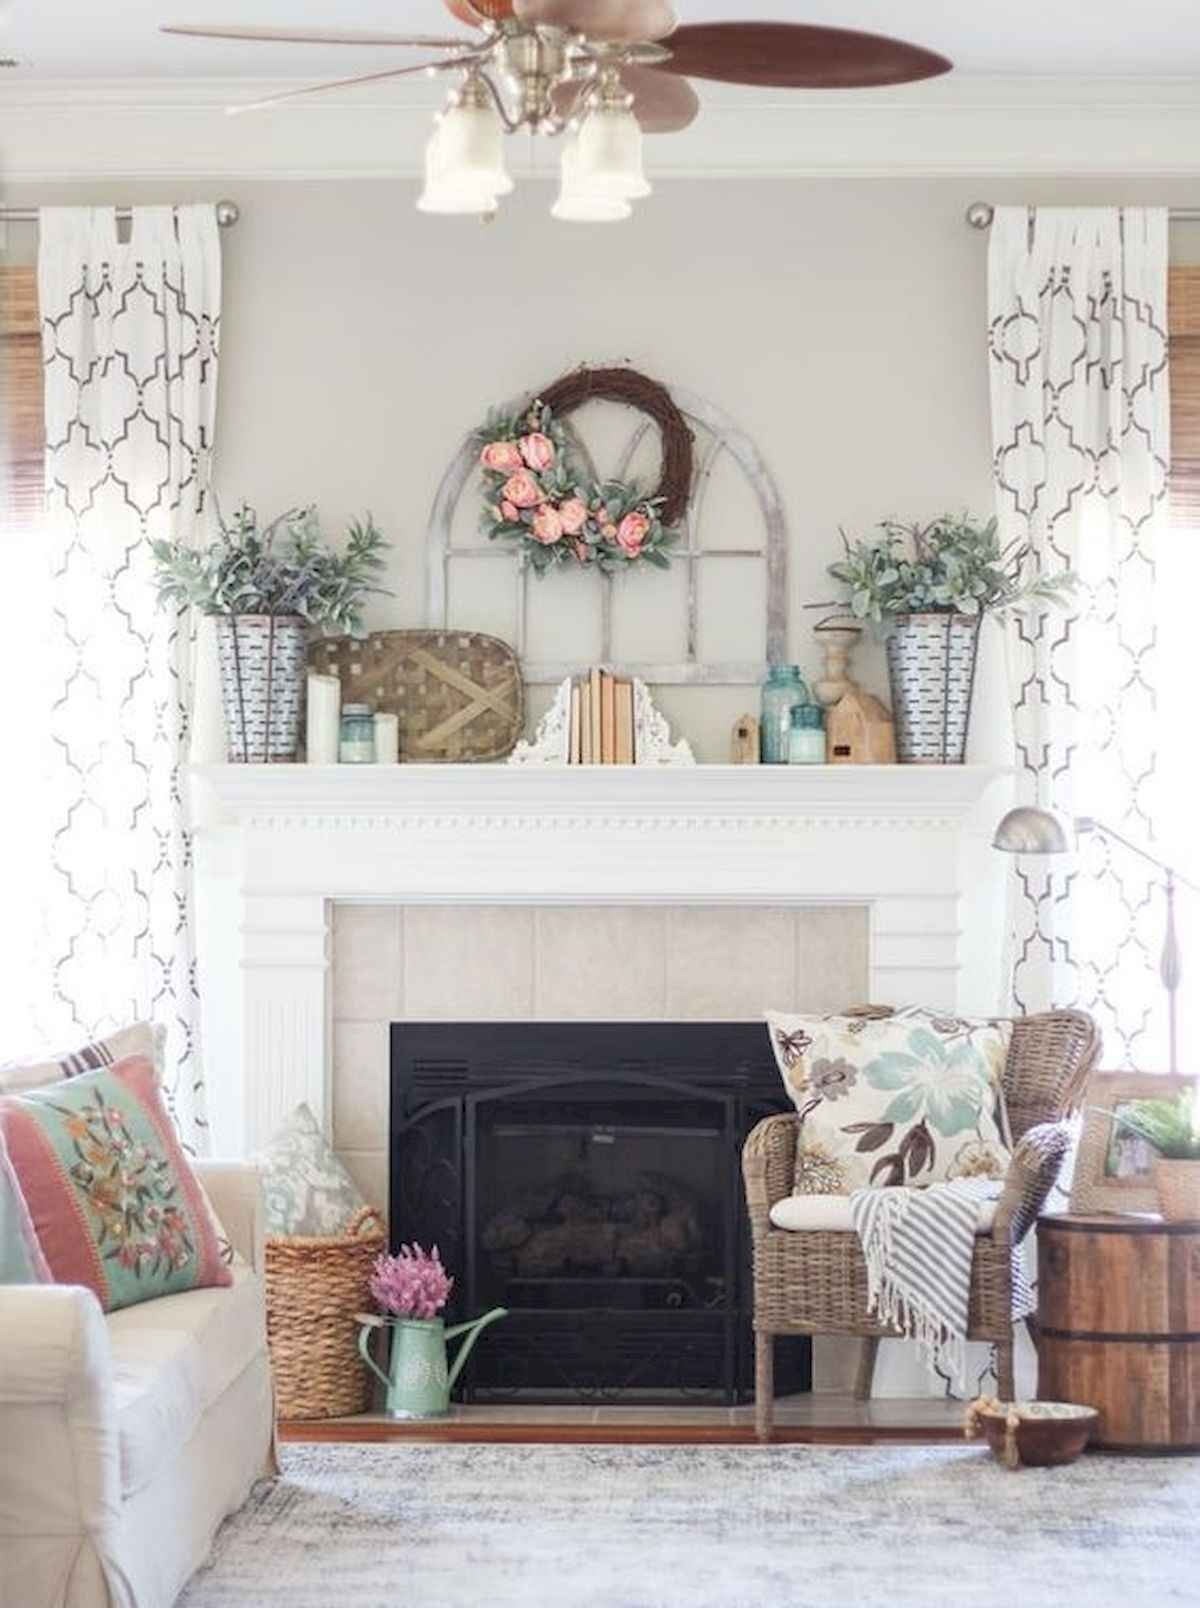 50 Beautiful Spring Mantel Decorating Ideas Fireplace Mantel Decor Spring Mantle Decor Spring Mantle